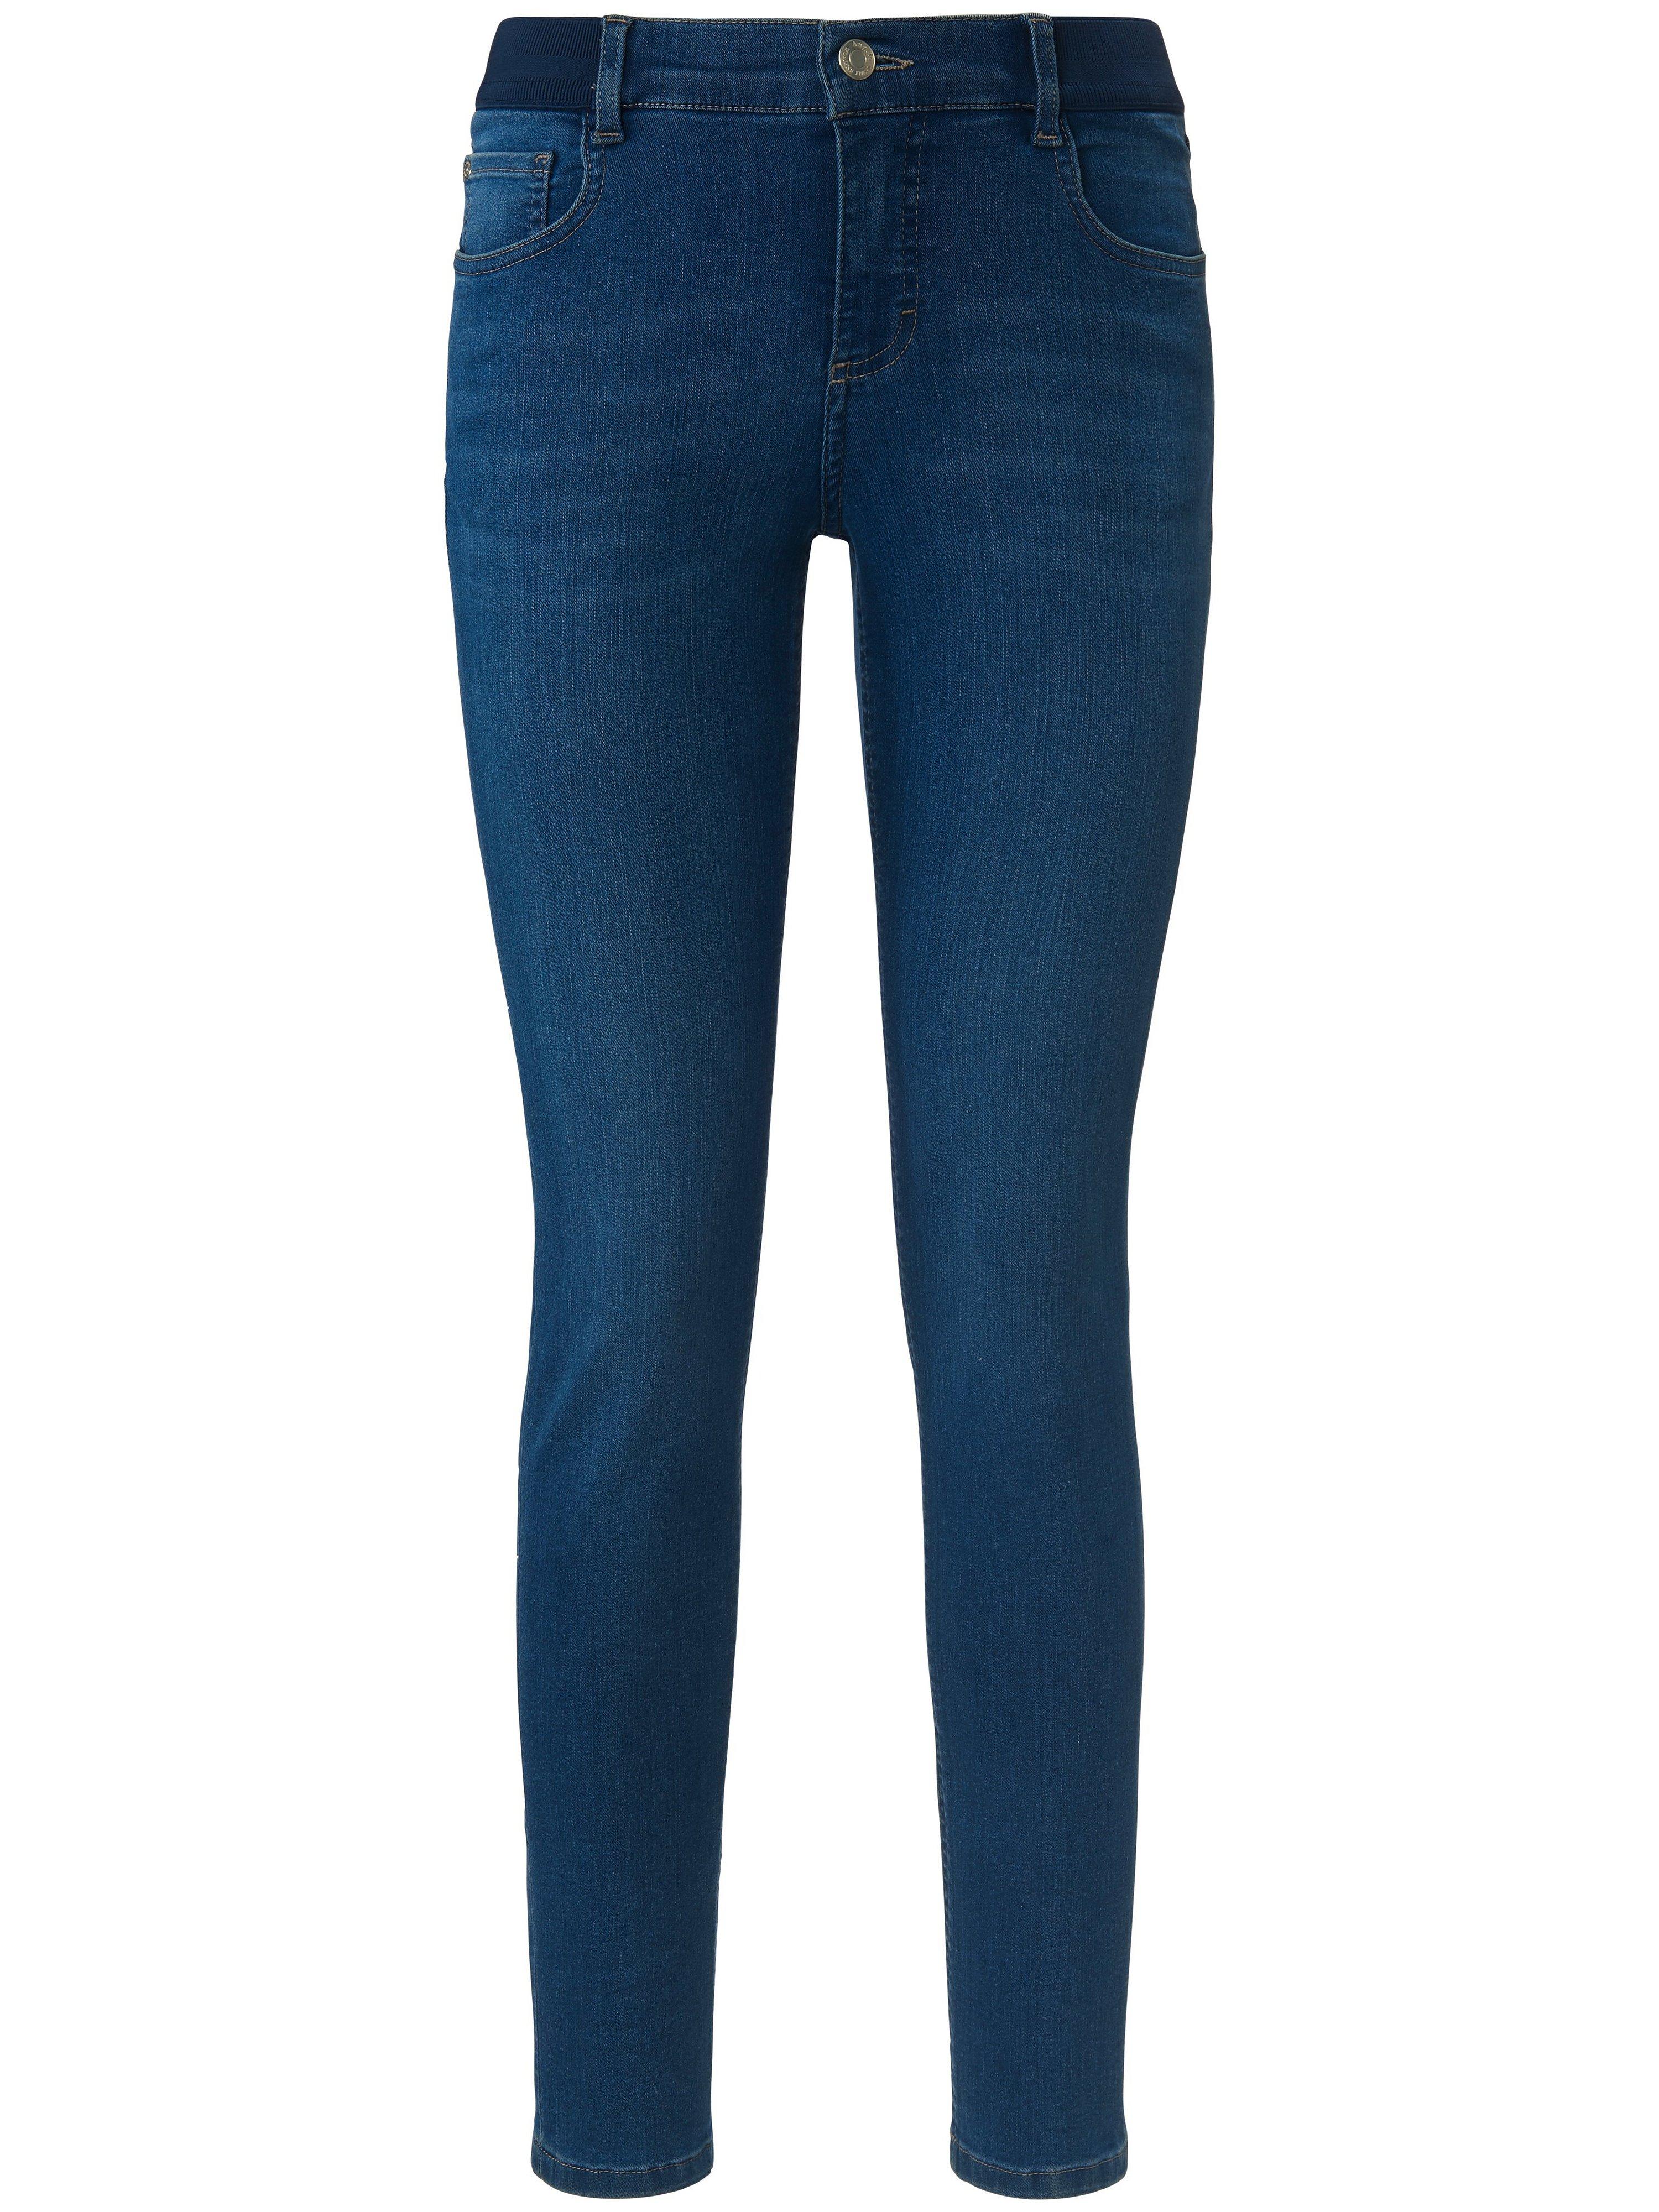 One size fits all-jeans Regular Fit Van ANGELS denim